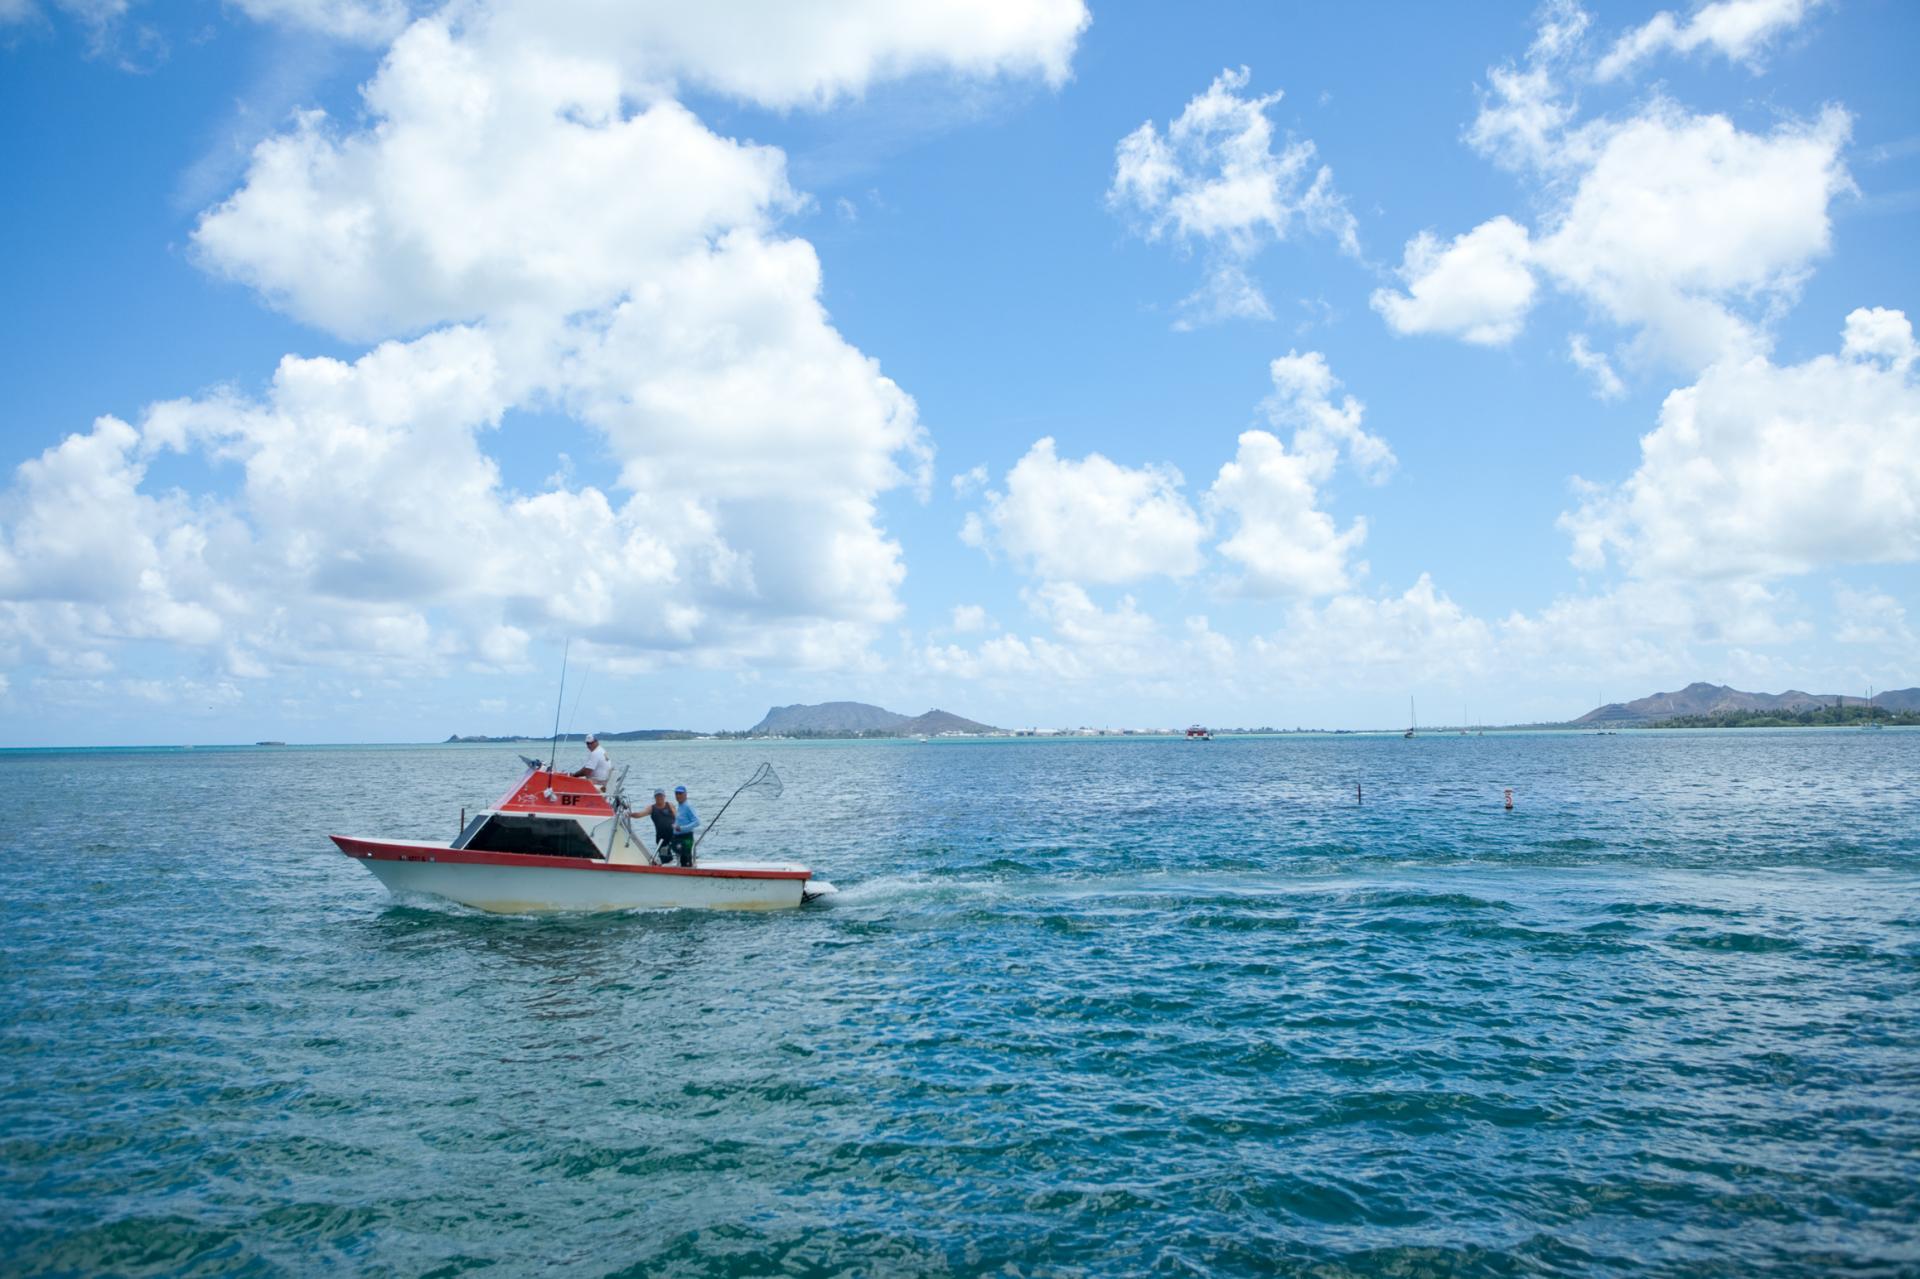 A fishing boat off the coast of Oahu